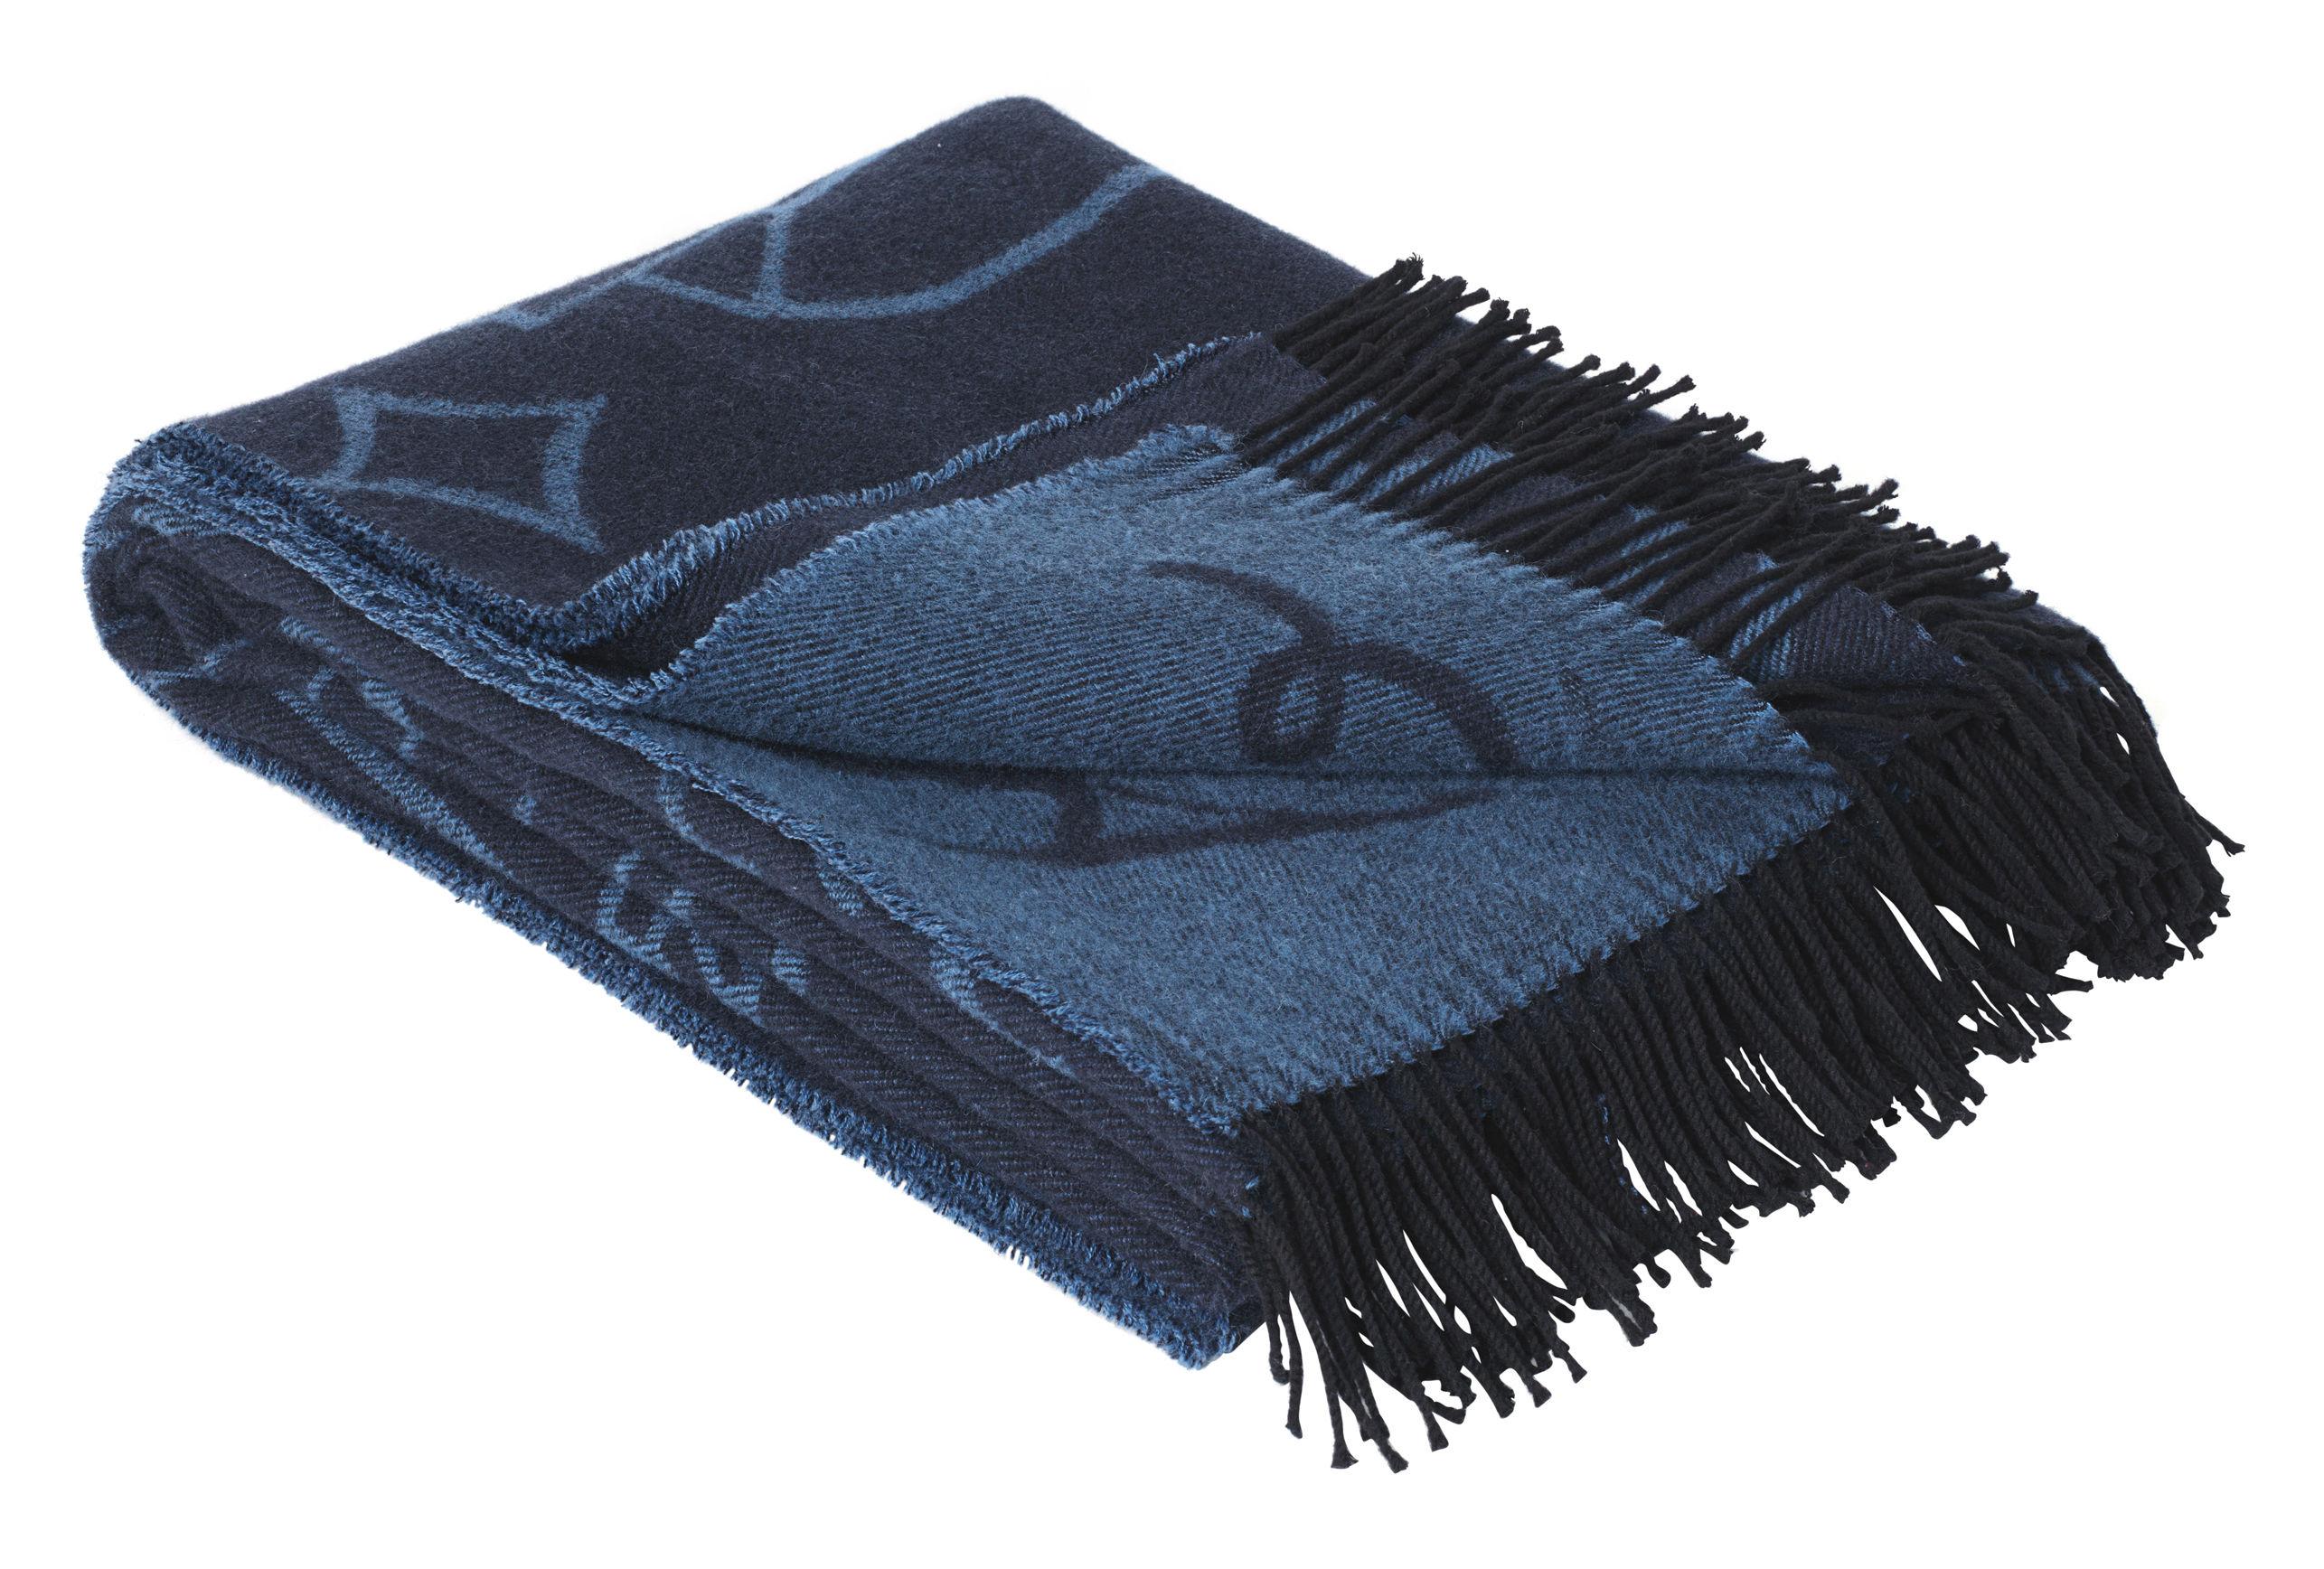 Decoration - Bedding & Bath Towels - Jaime Hayón Plaid - / 200 x 130 cm - Merino wool & Alpaca by Fritz Hansen - Blue - Alpaga, Cotton, Merinos wool